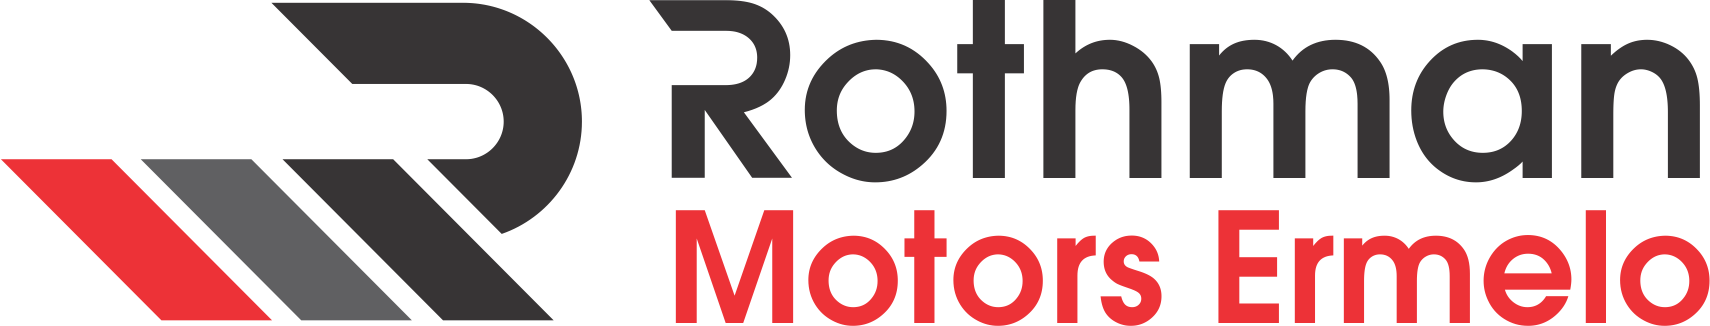 Rothman Motors Ermelo